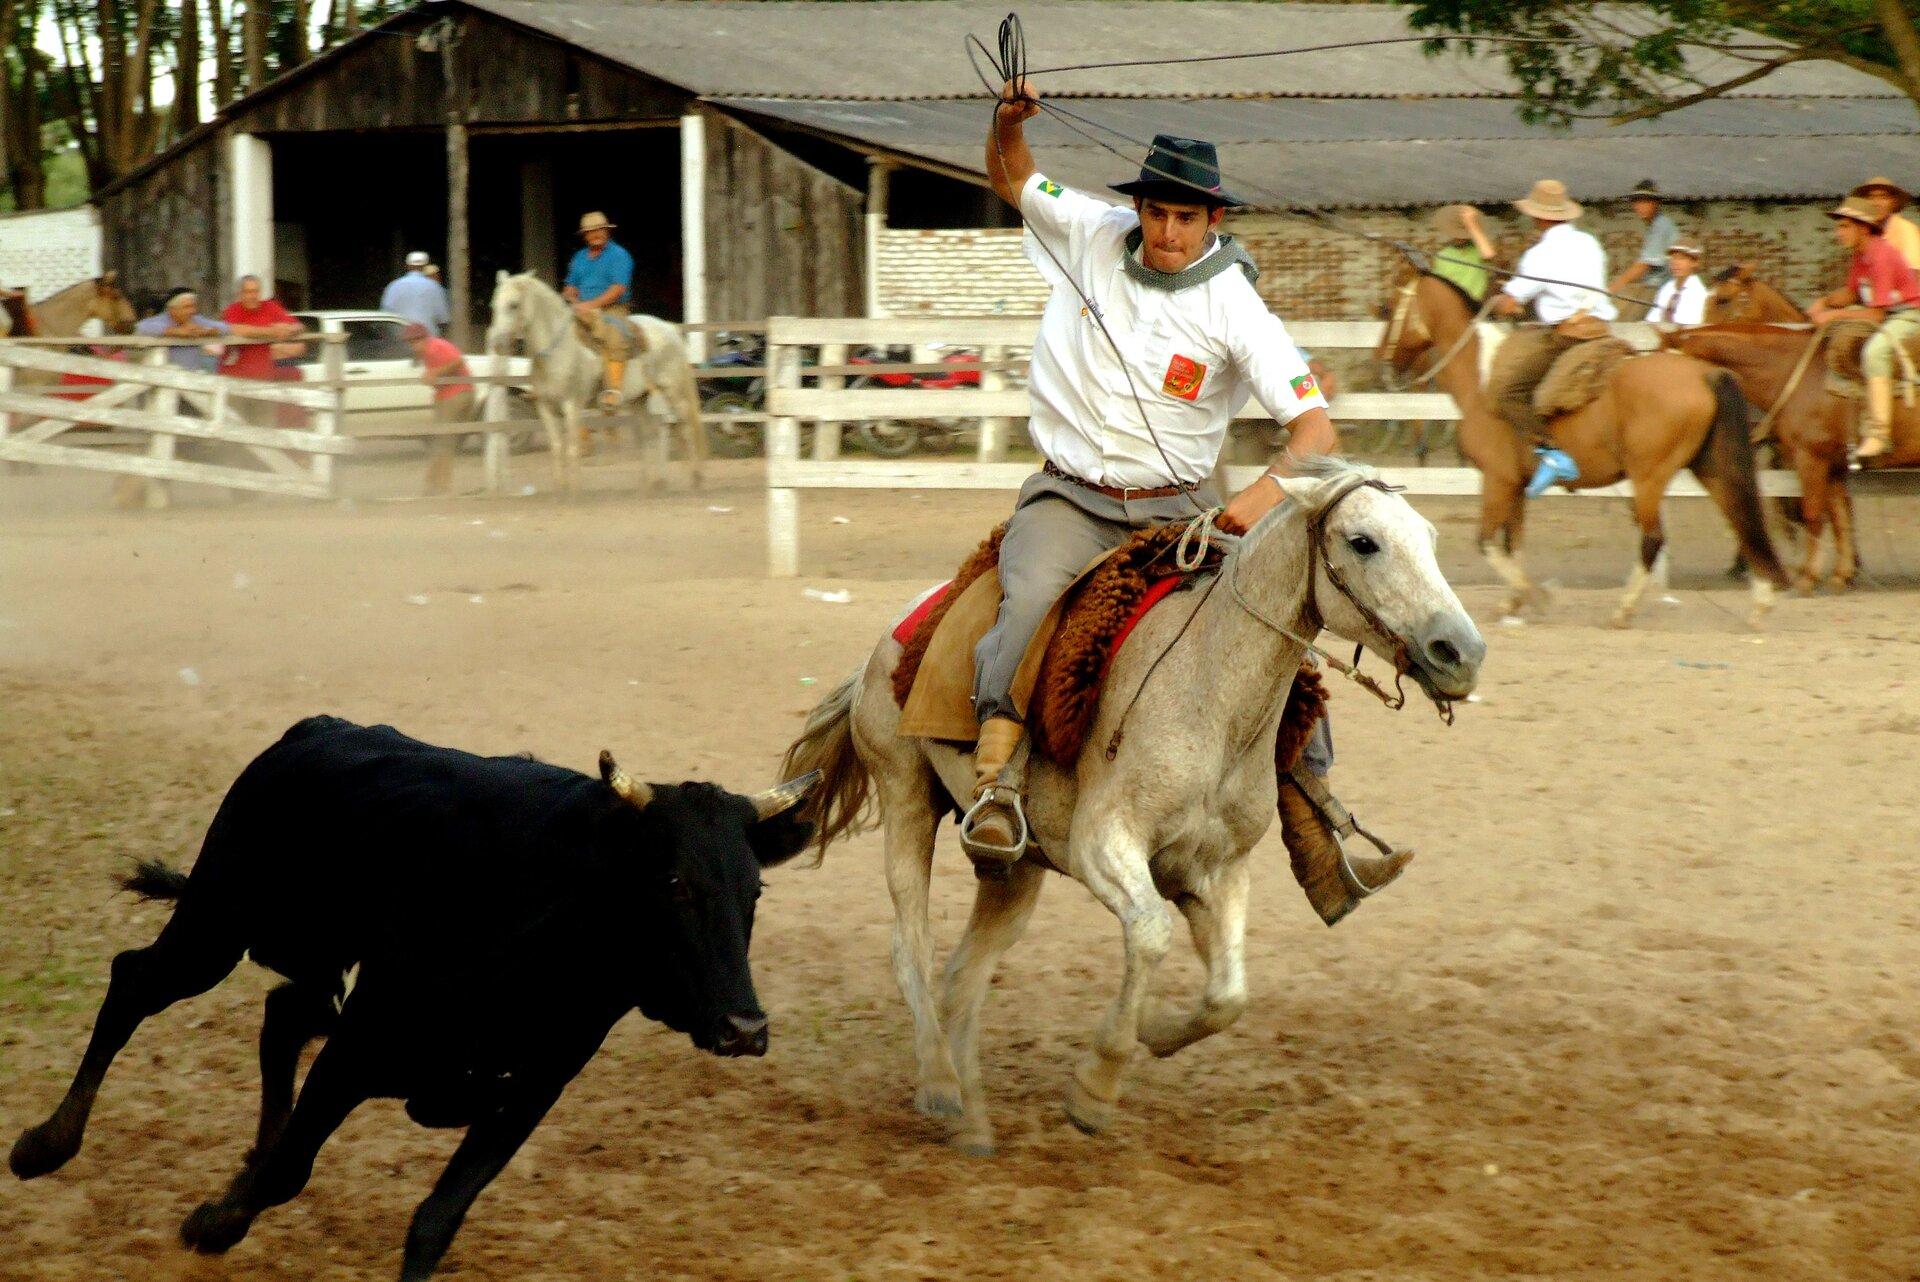 Cavalo Lacando Boi —